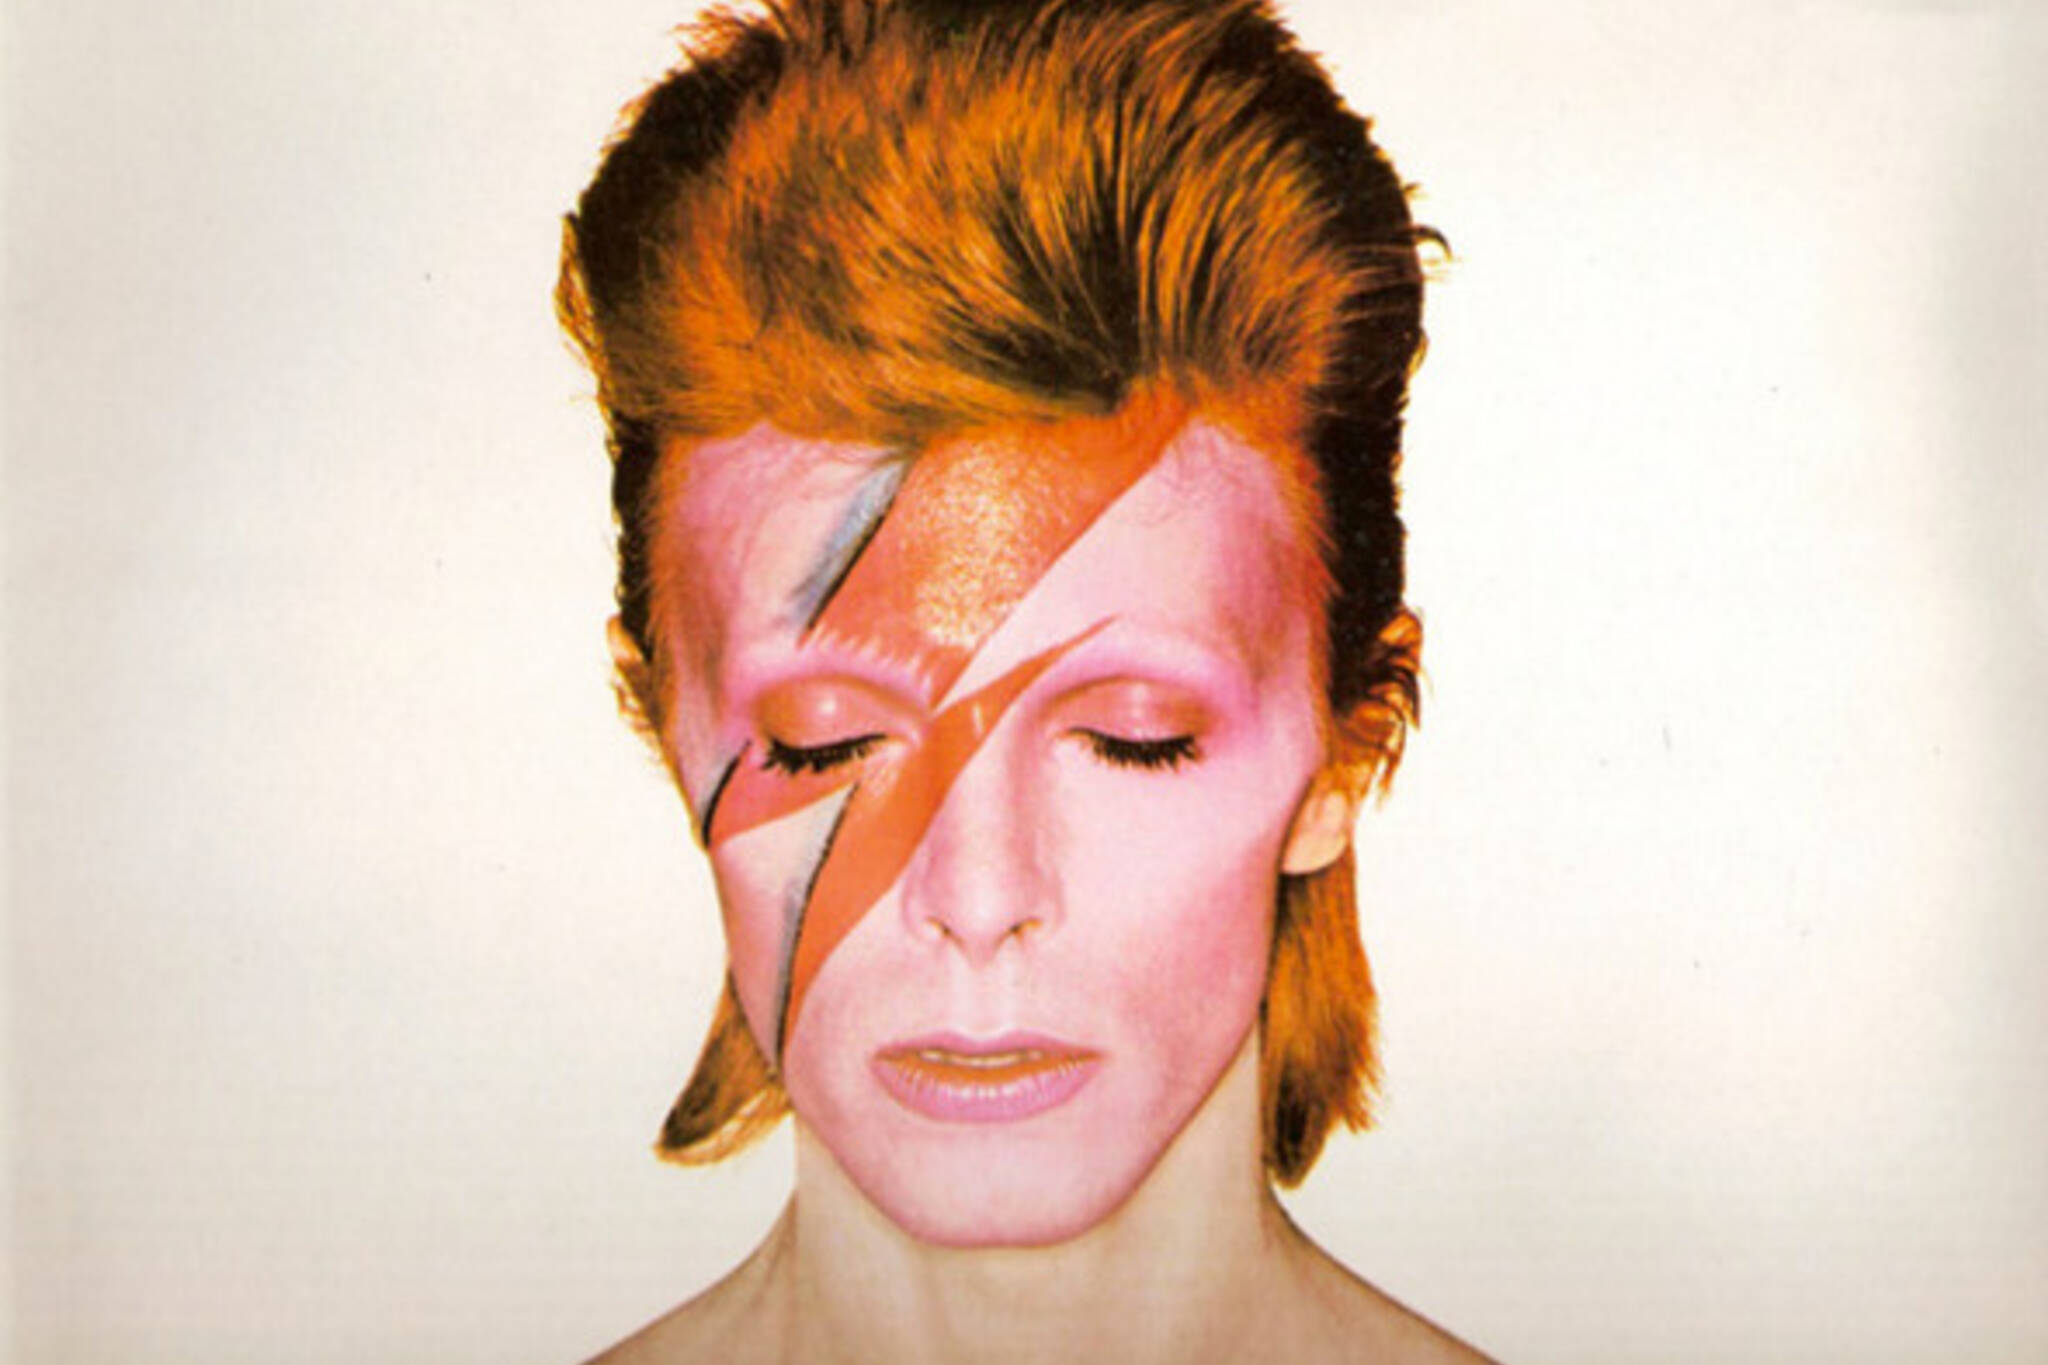 Toronto David Bowie